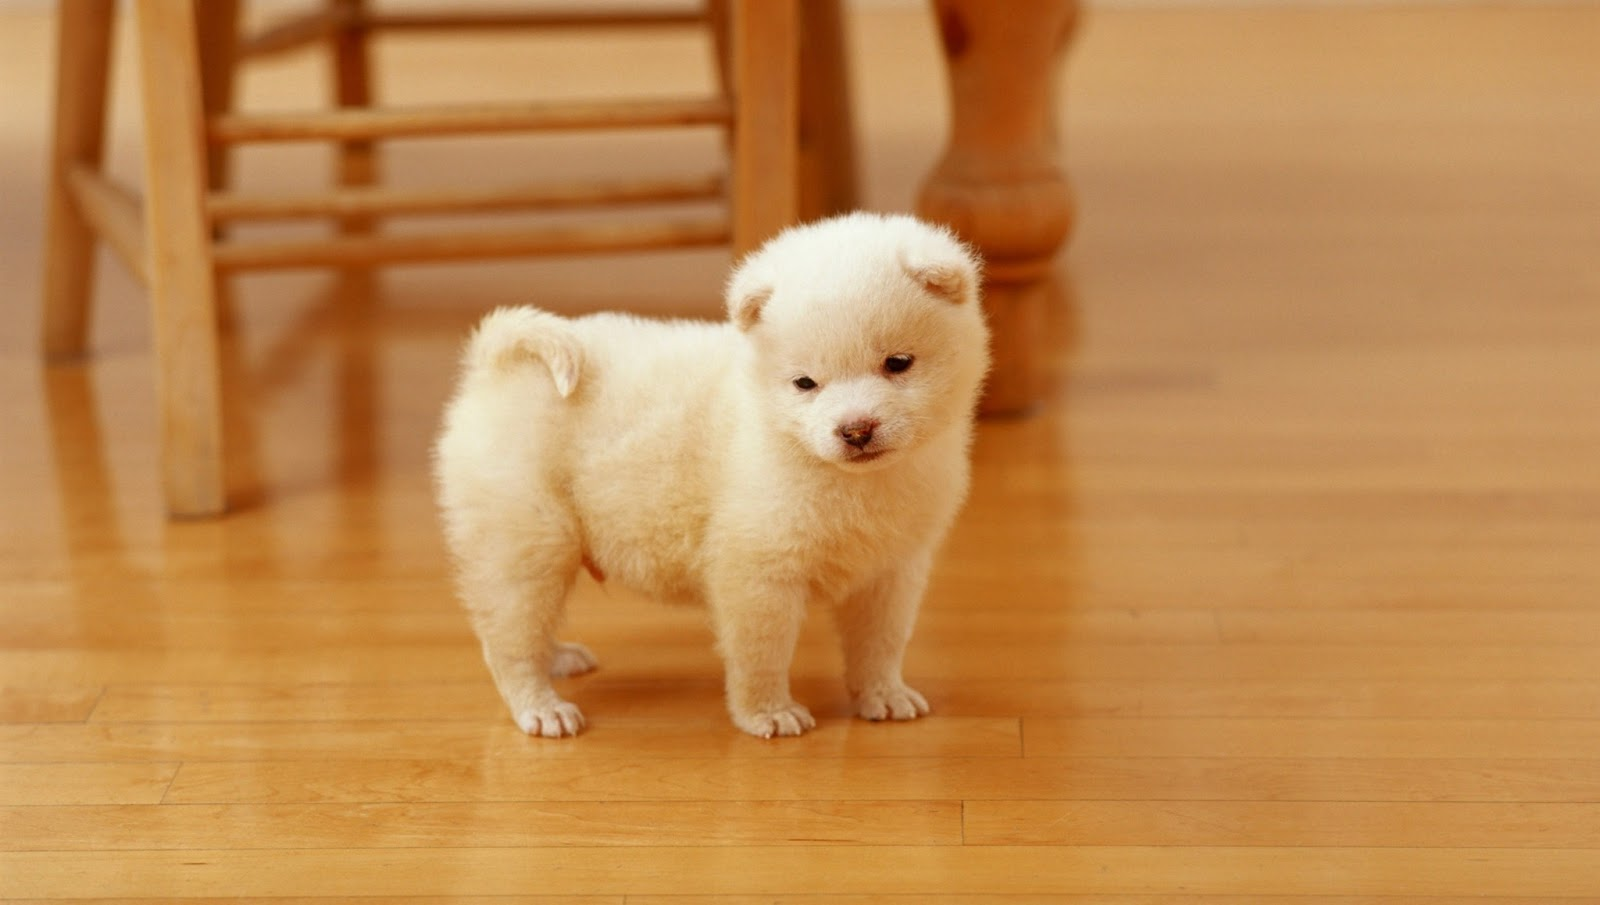 http://1.bp.blogspot.com/-qZUXGzs__-E/UQaL2CObkXI/AAAAAAAAHII/w0Hdyb3zpbU/s1600/Akita+Puppies+hd+Wallpapers_3.jpg